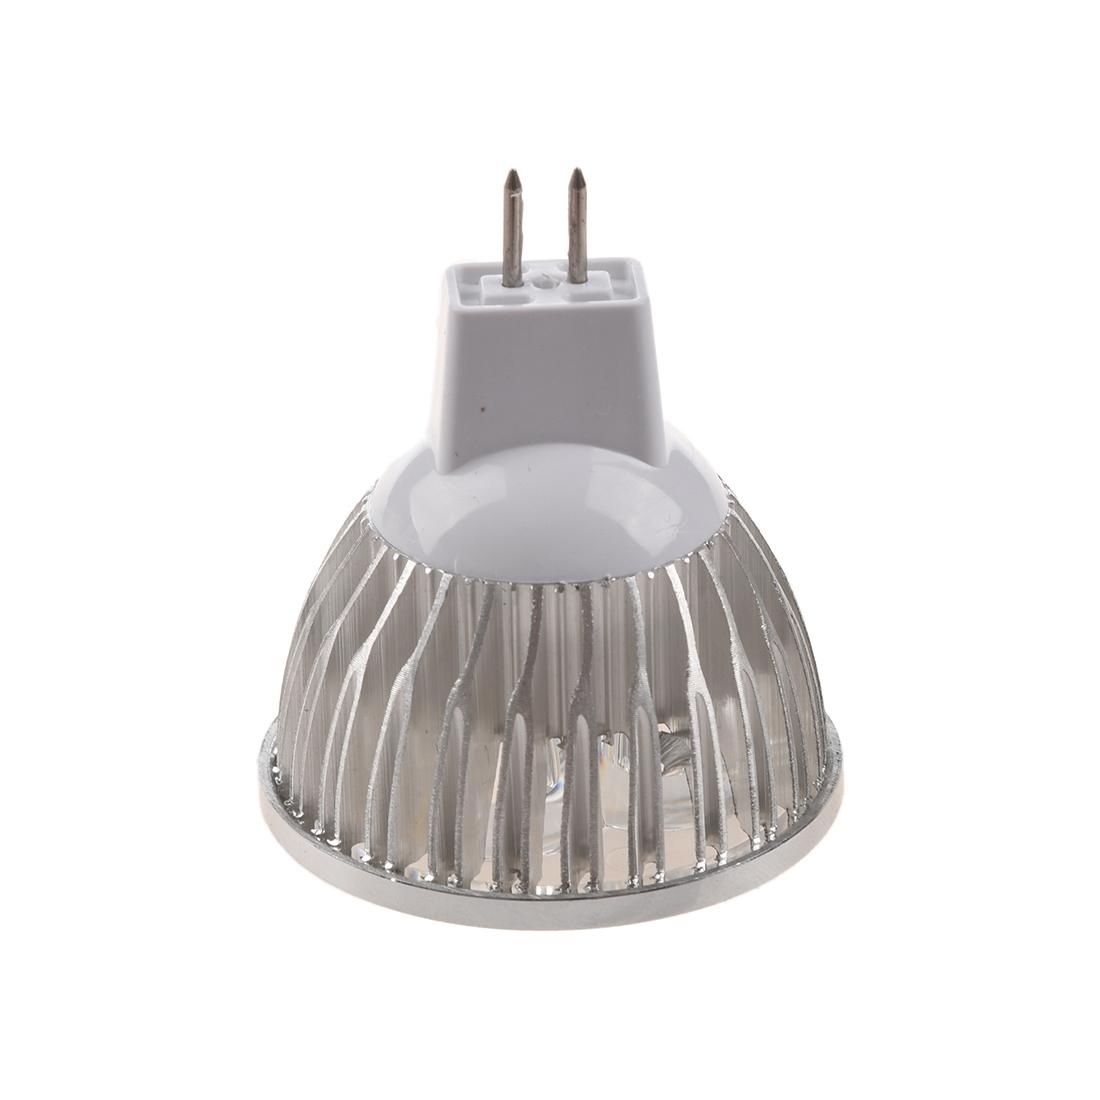 4 1w gu5 3 mr16 12v led ampoule lampe blanc chaud. Black Bedroom Furniture Sets. Home Design Ideas